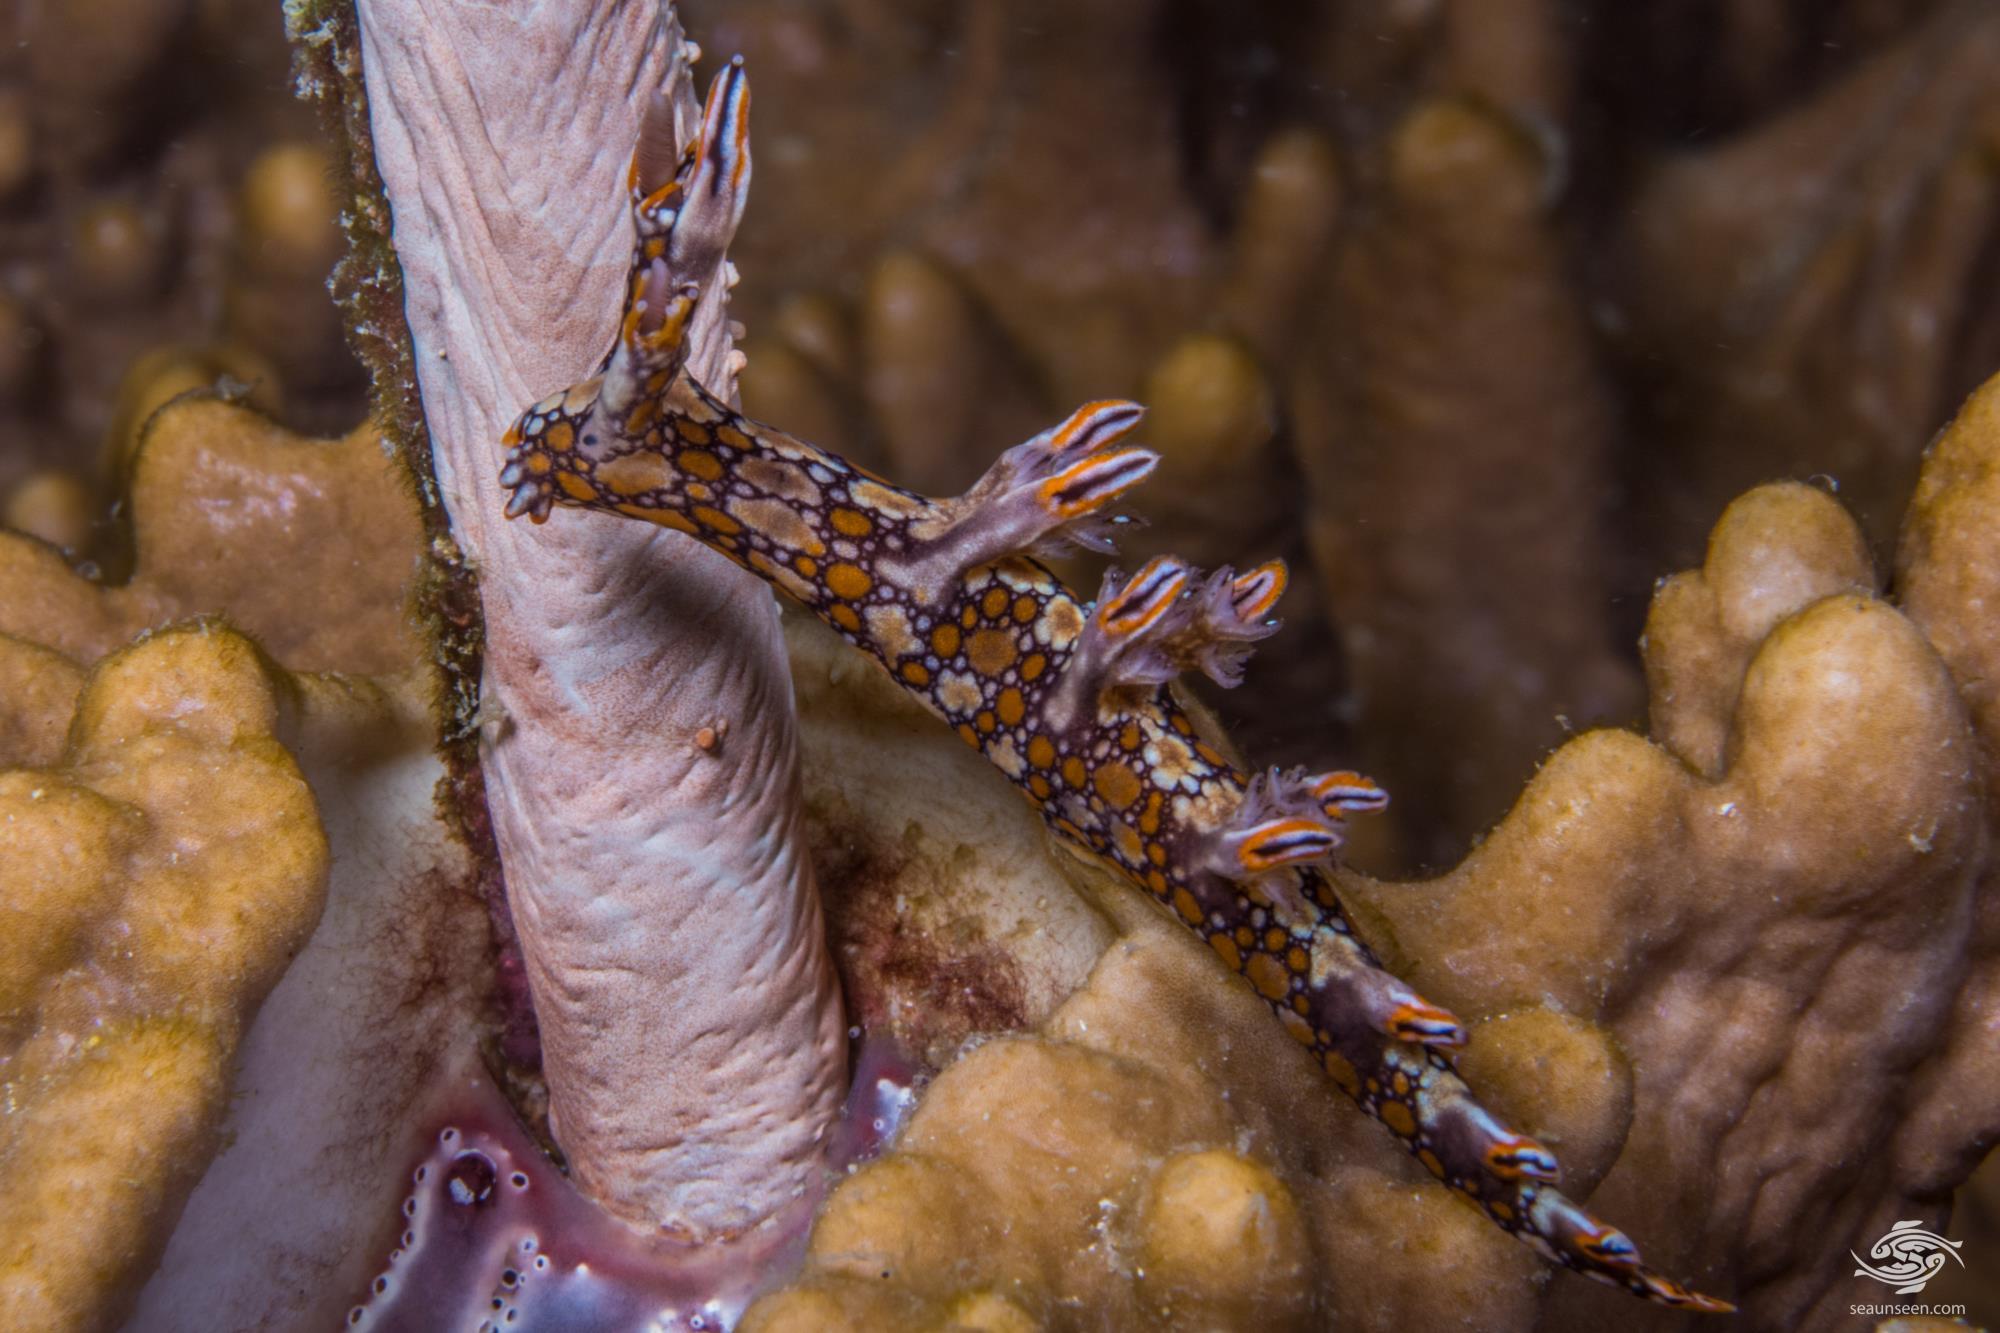 Bornella anguilla also known as the Snakey Nudibranch swimming